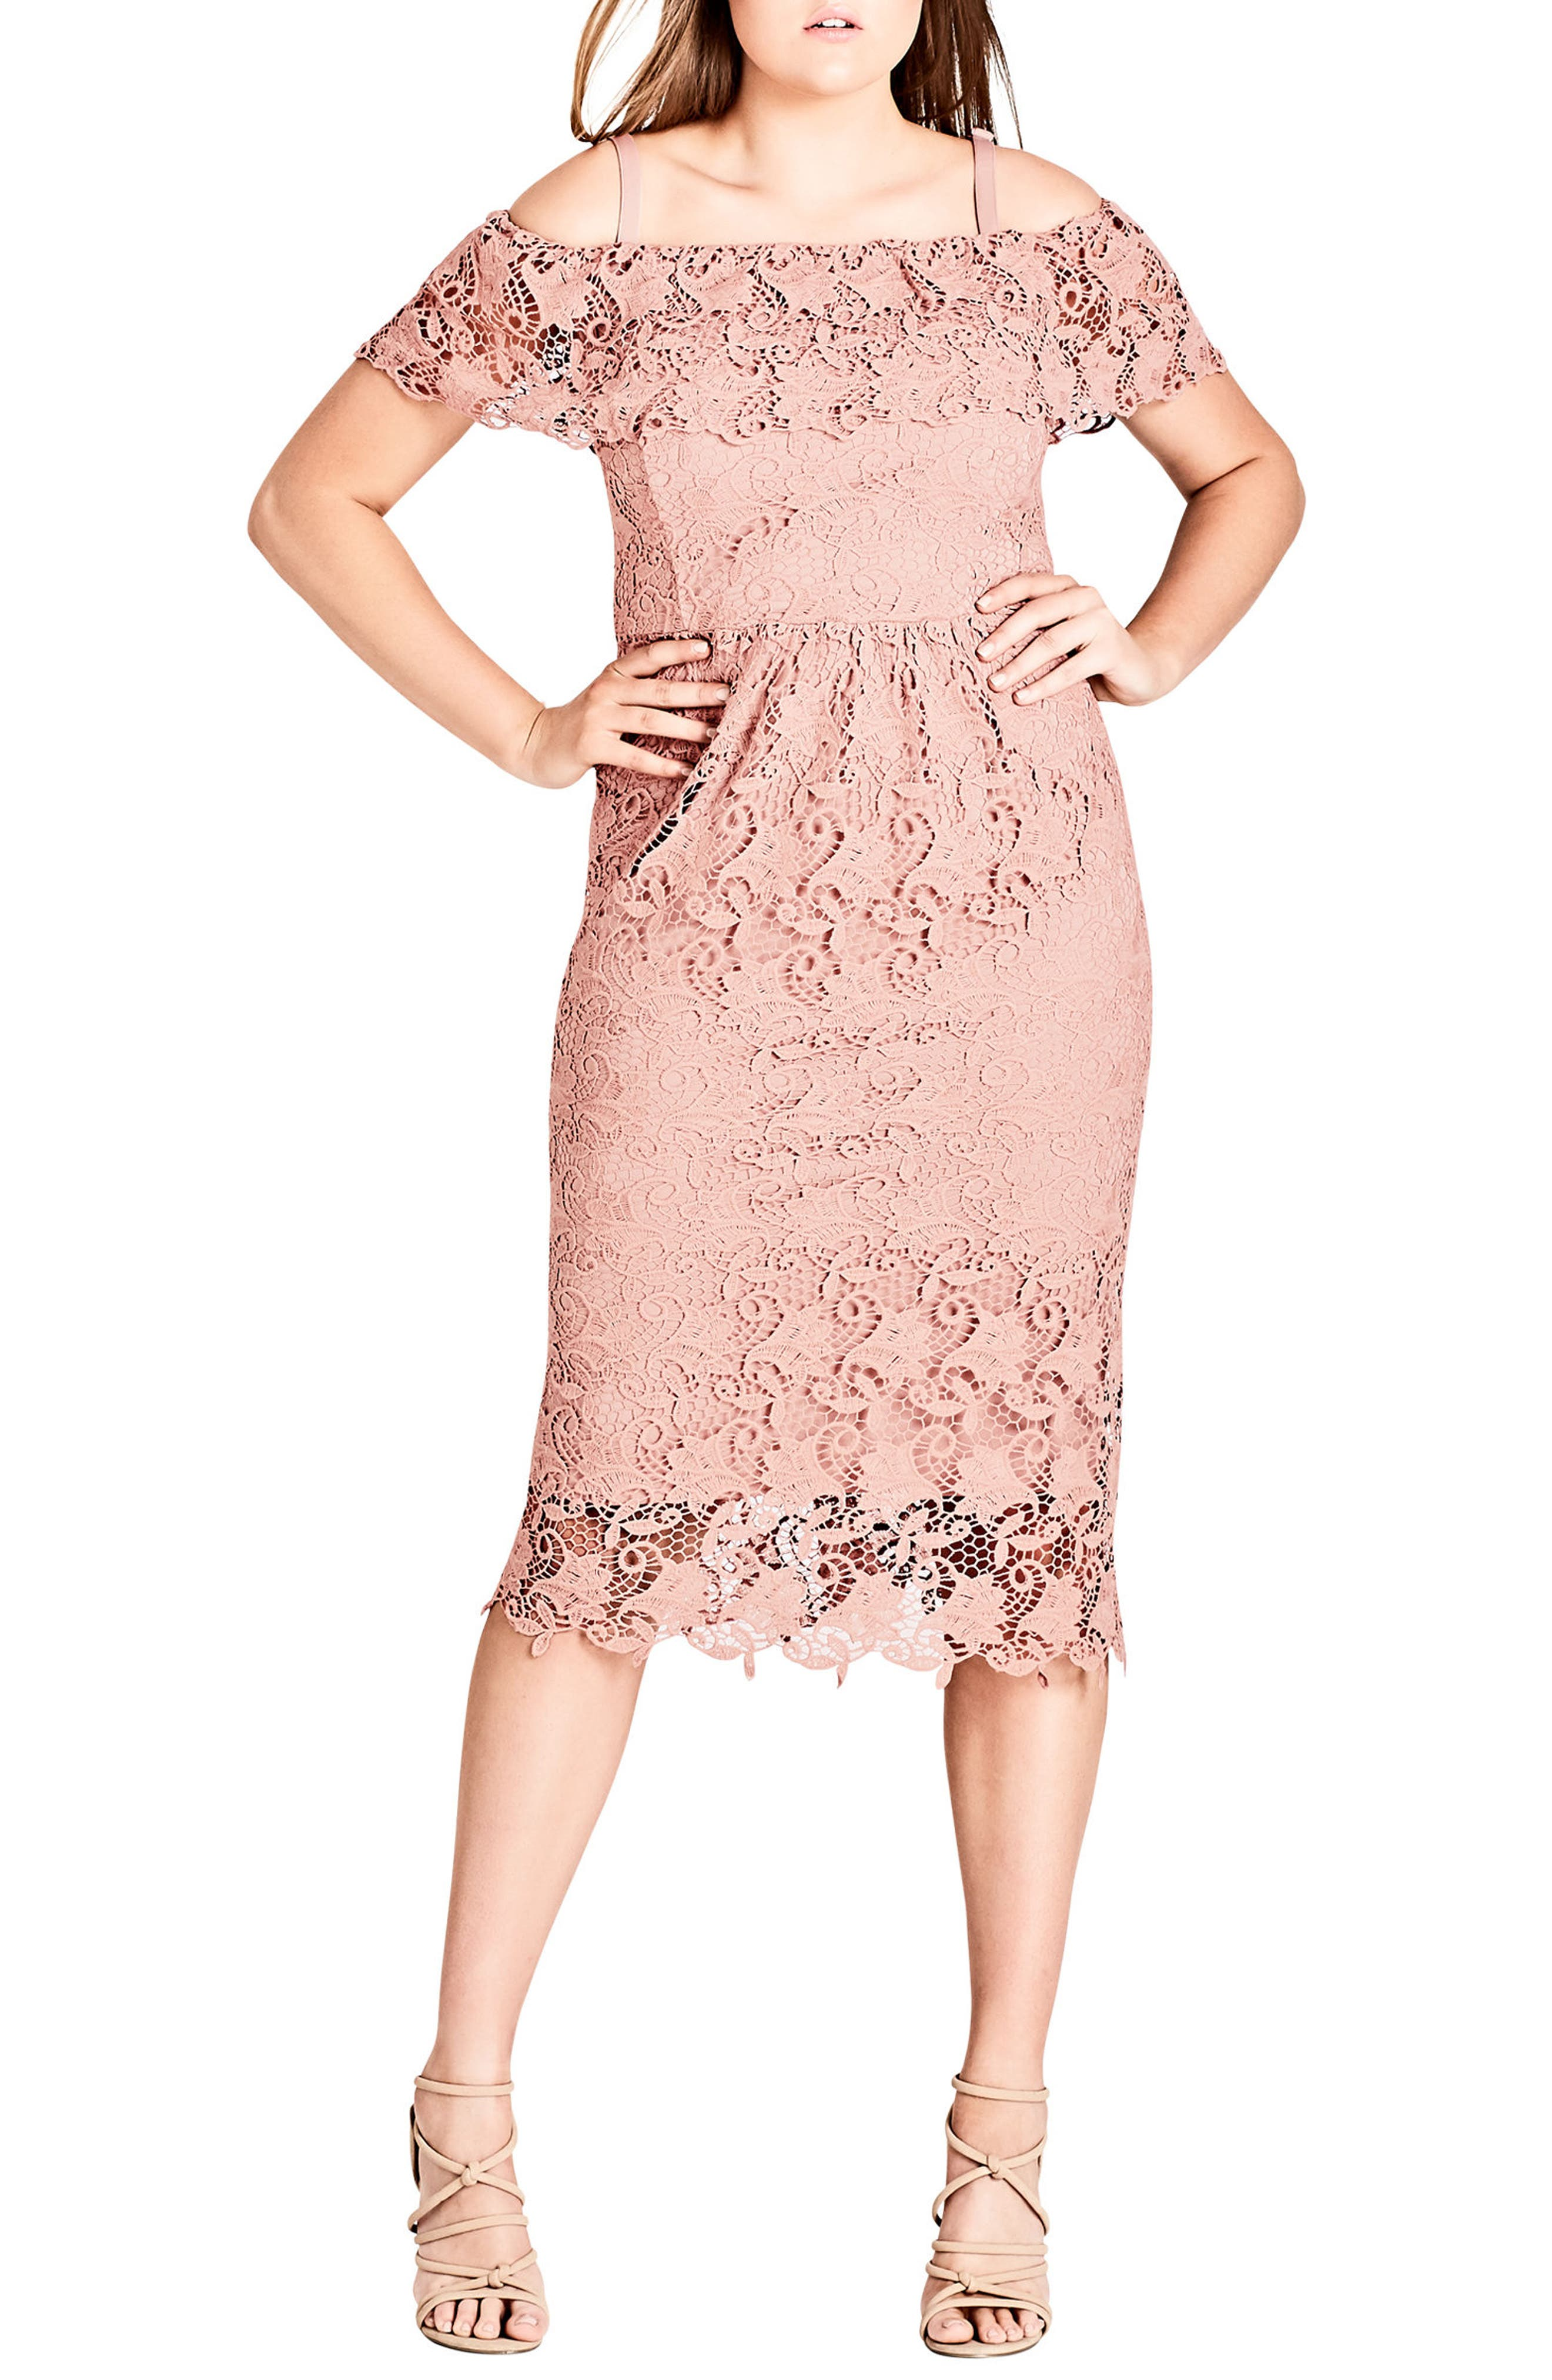 Spring Day Off the Shoulder Lace Sheath Dress,                         Main,                         color, Ballet Pink